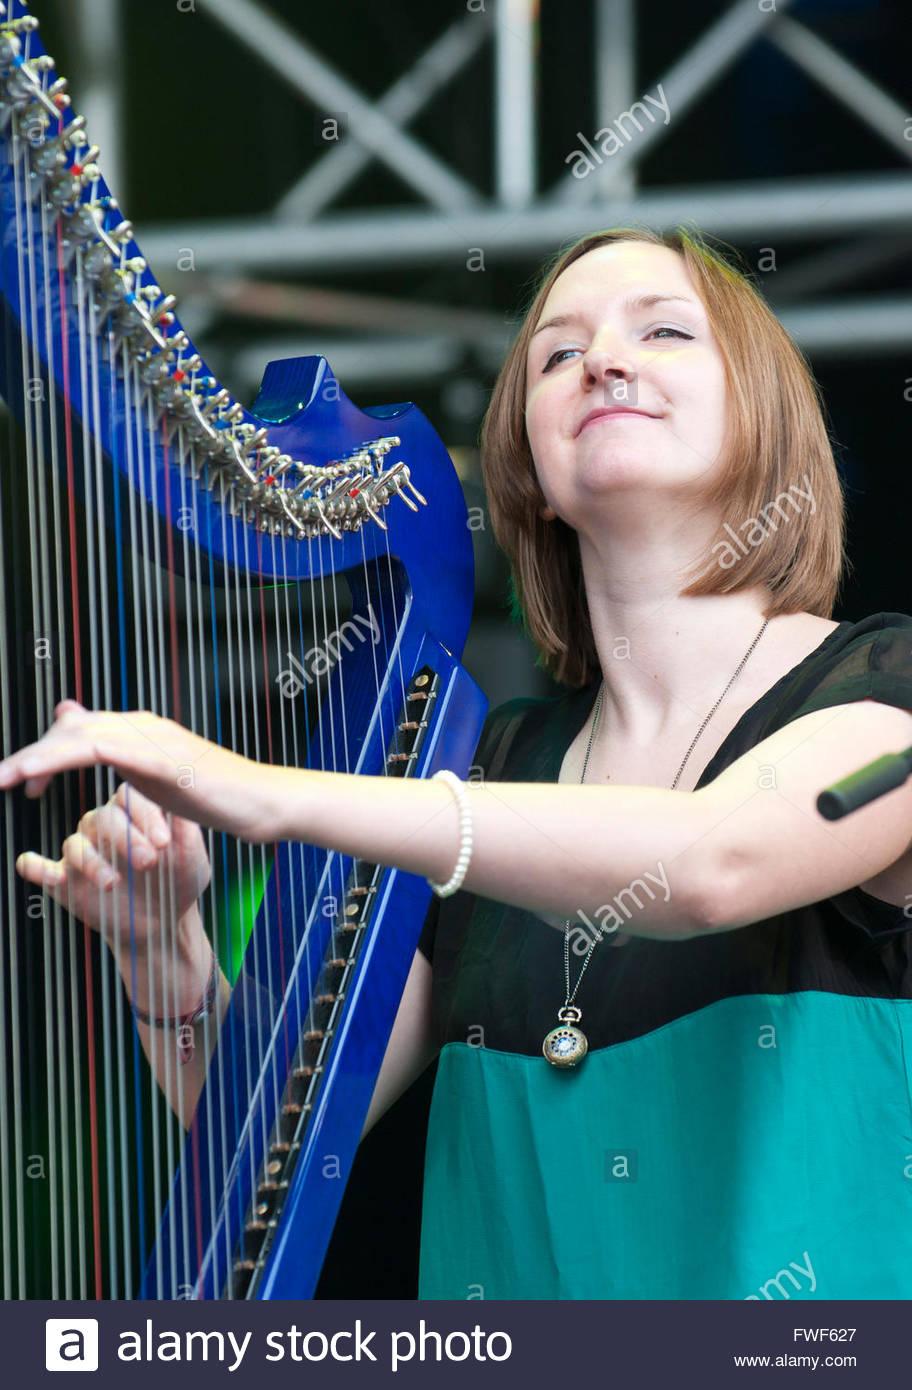 Rachel Newton of The Shee at Fairport's Cropredy festival, UK, 2011. - Stock Image